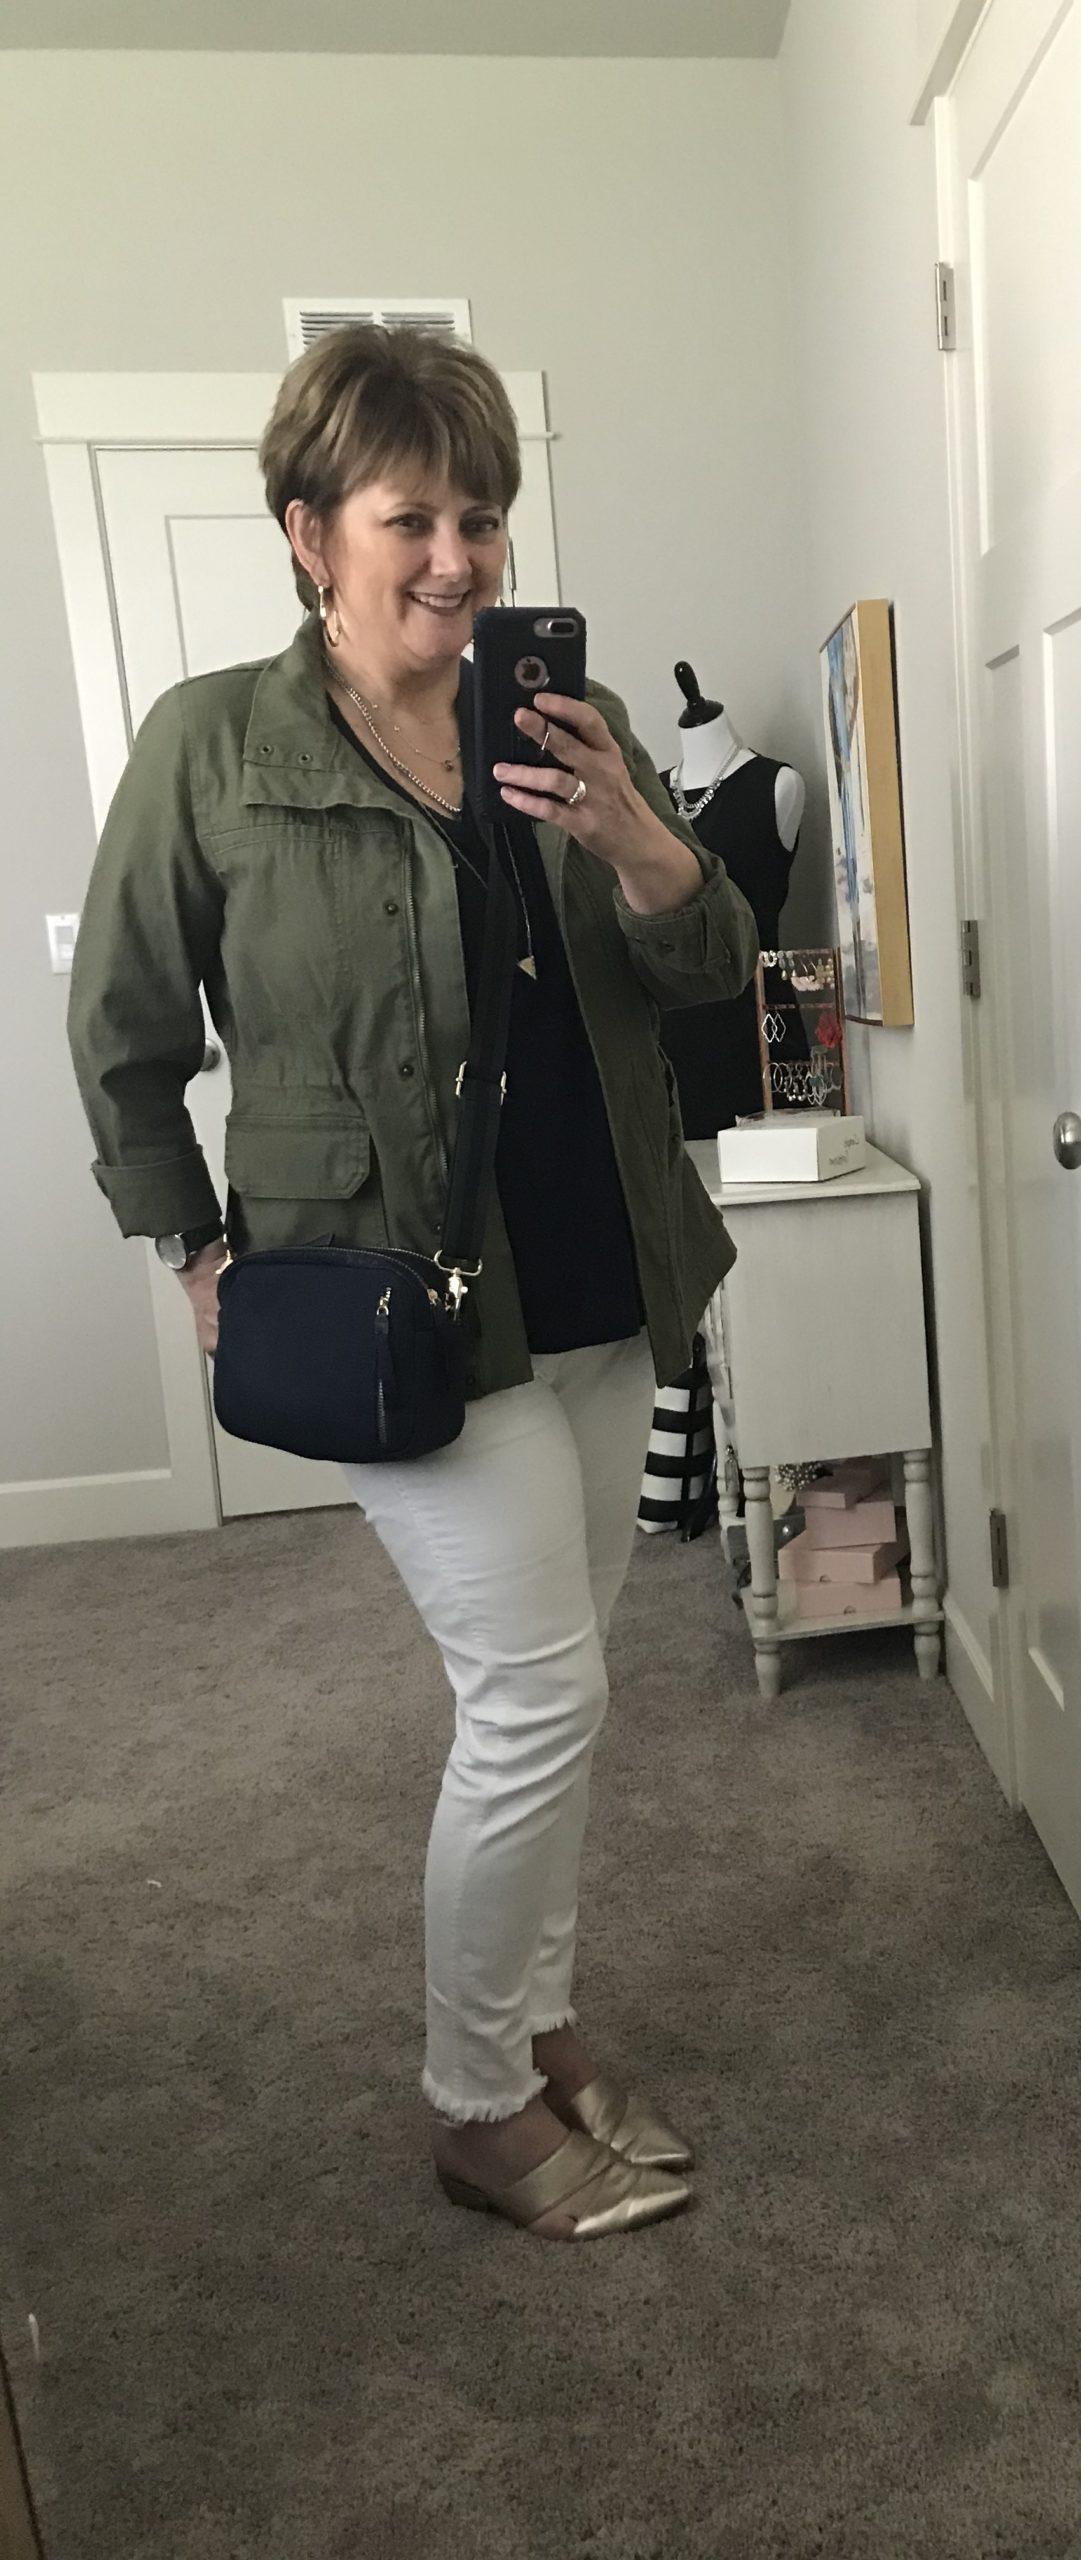 Wardrobe Staple: Utility Jacket